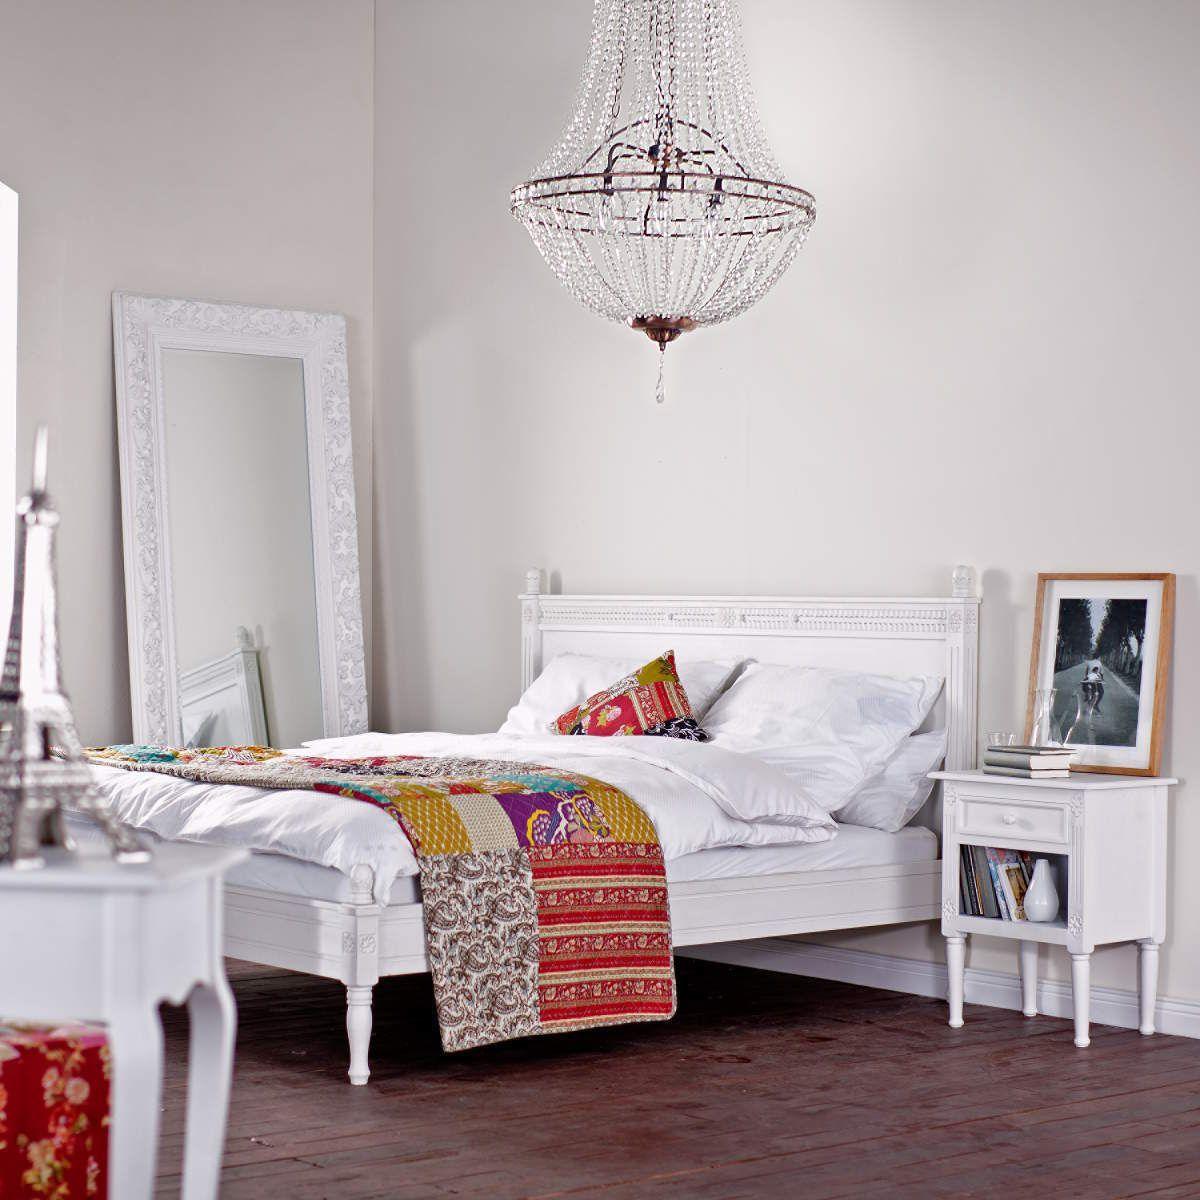 edelweiß und bunt ♥ Bett ideen, Bettgestell